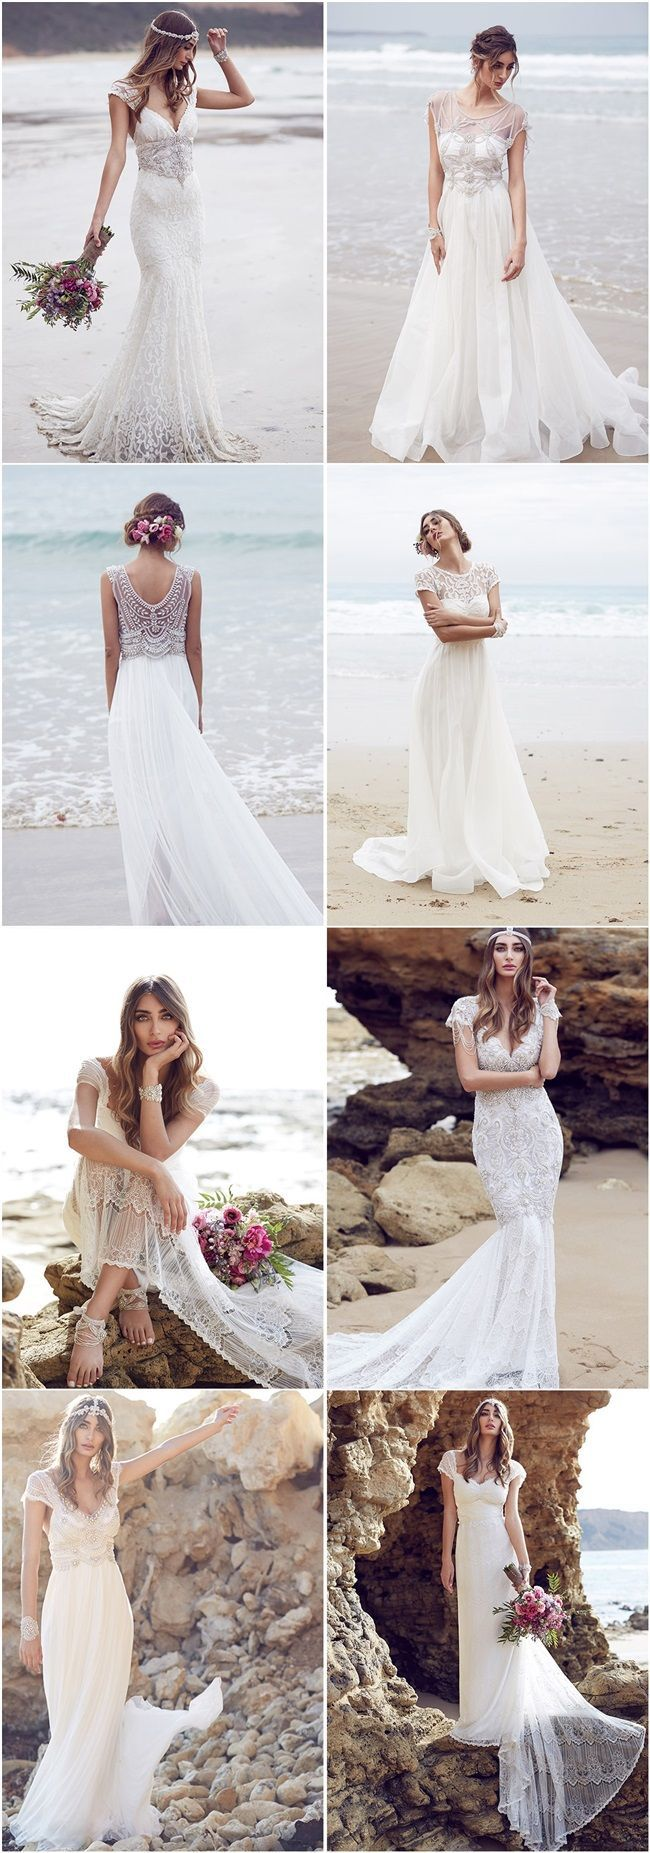 Anna Campbell 2016 Spirit Wedding Dresses | http://www.deerpearlflowers.com/anna-campbell-2016-spirit-wedding-dresses/: